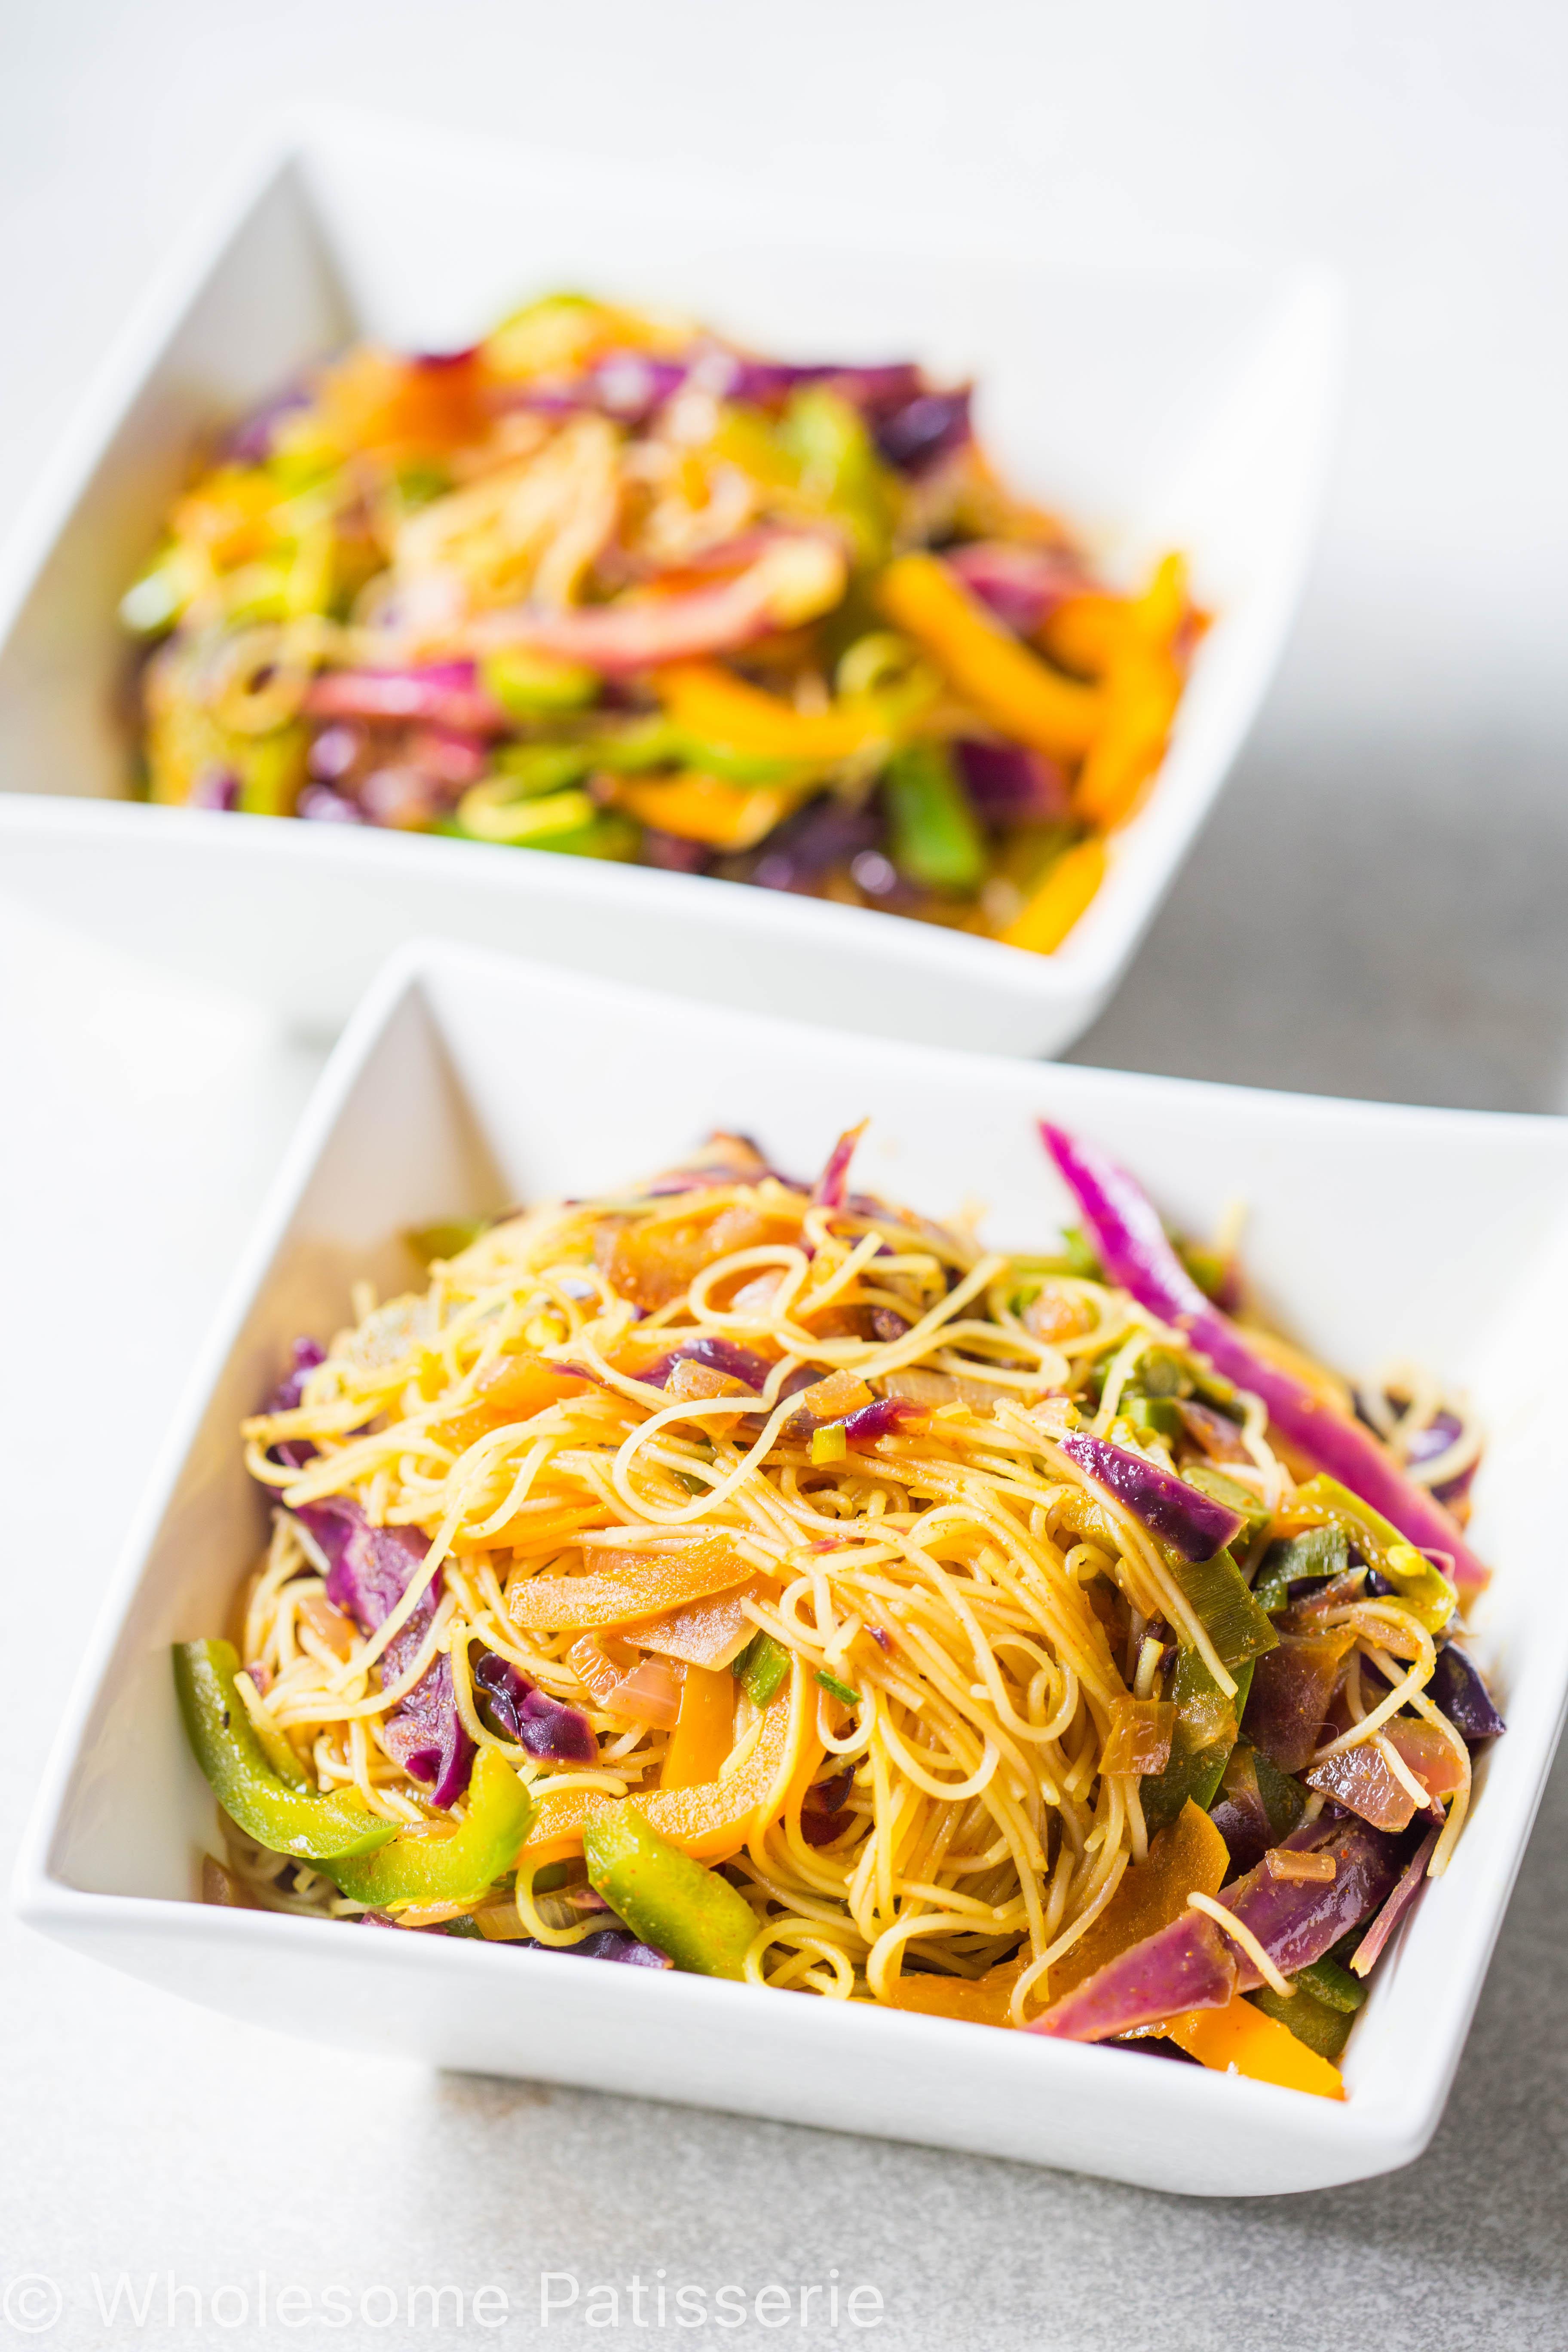 singapore-noodles-gluten-free-delicious-spicy-vegan-noodles-asian